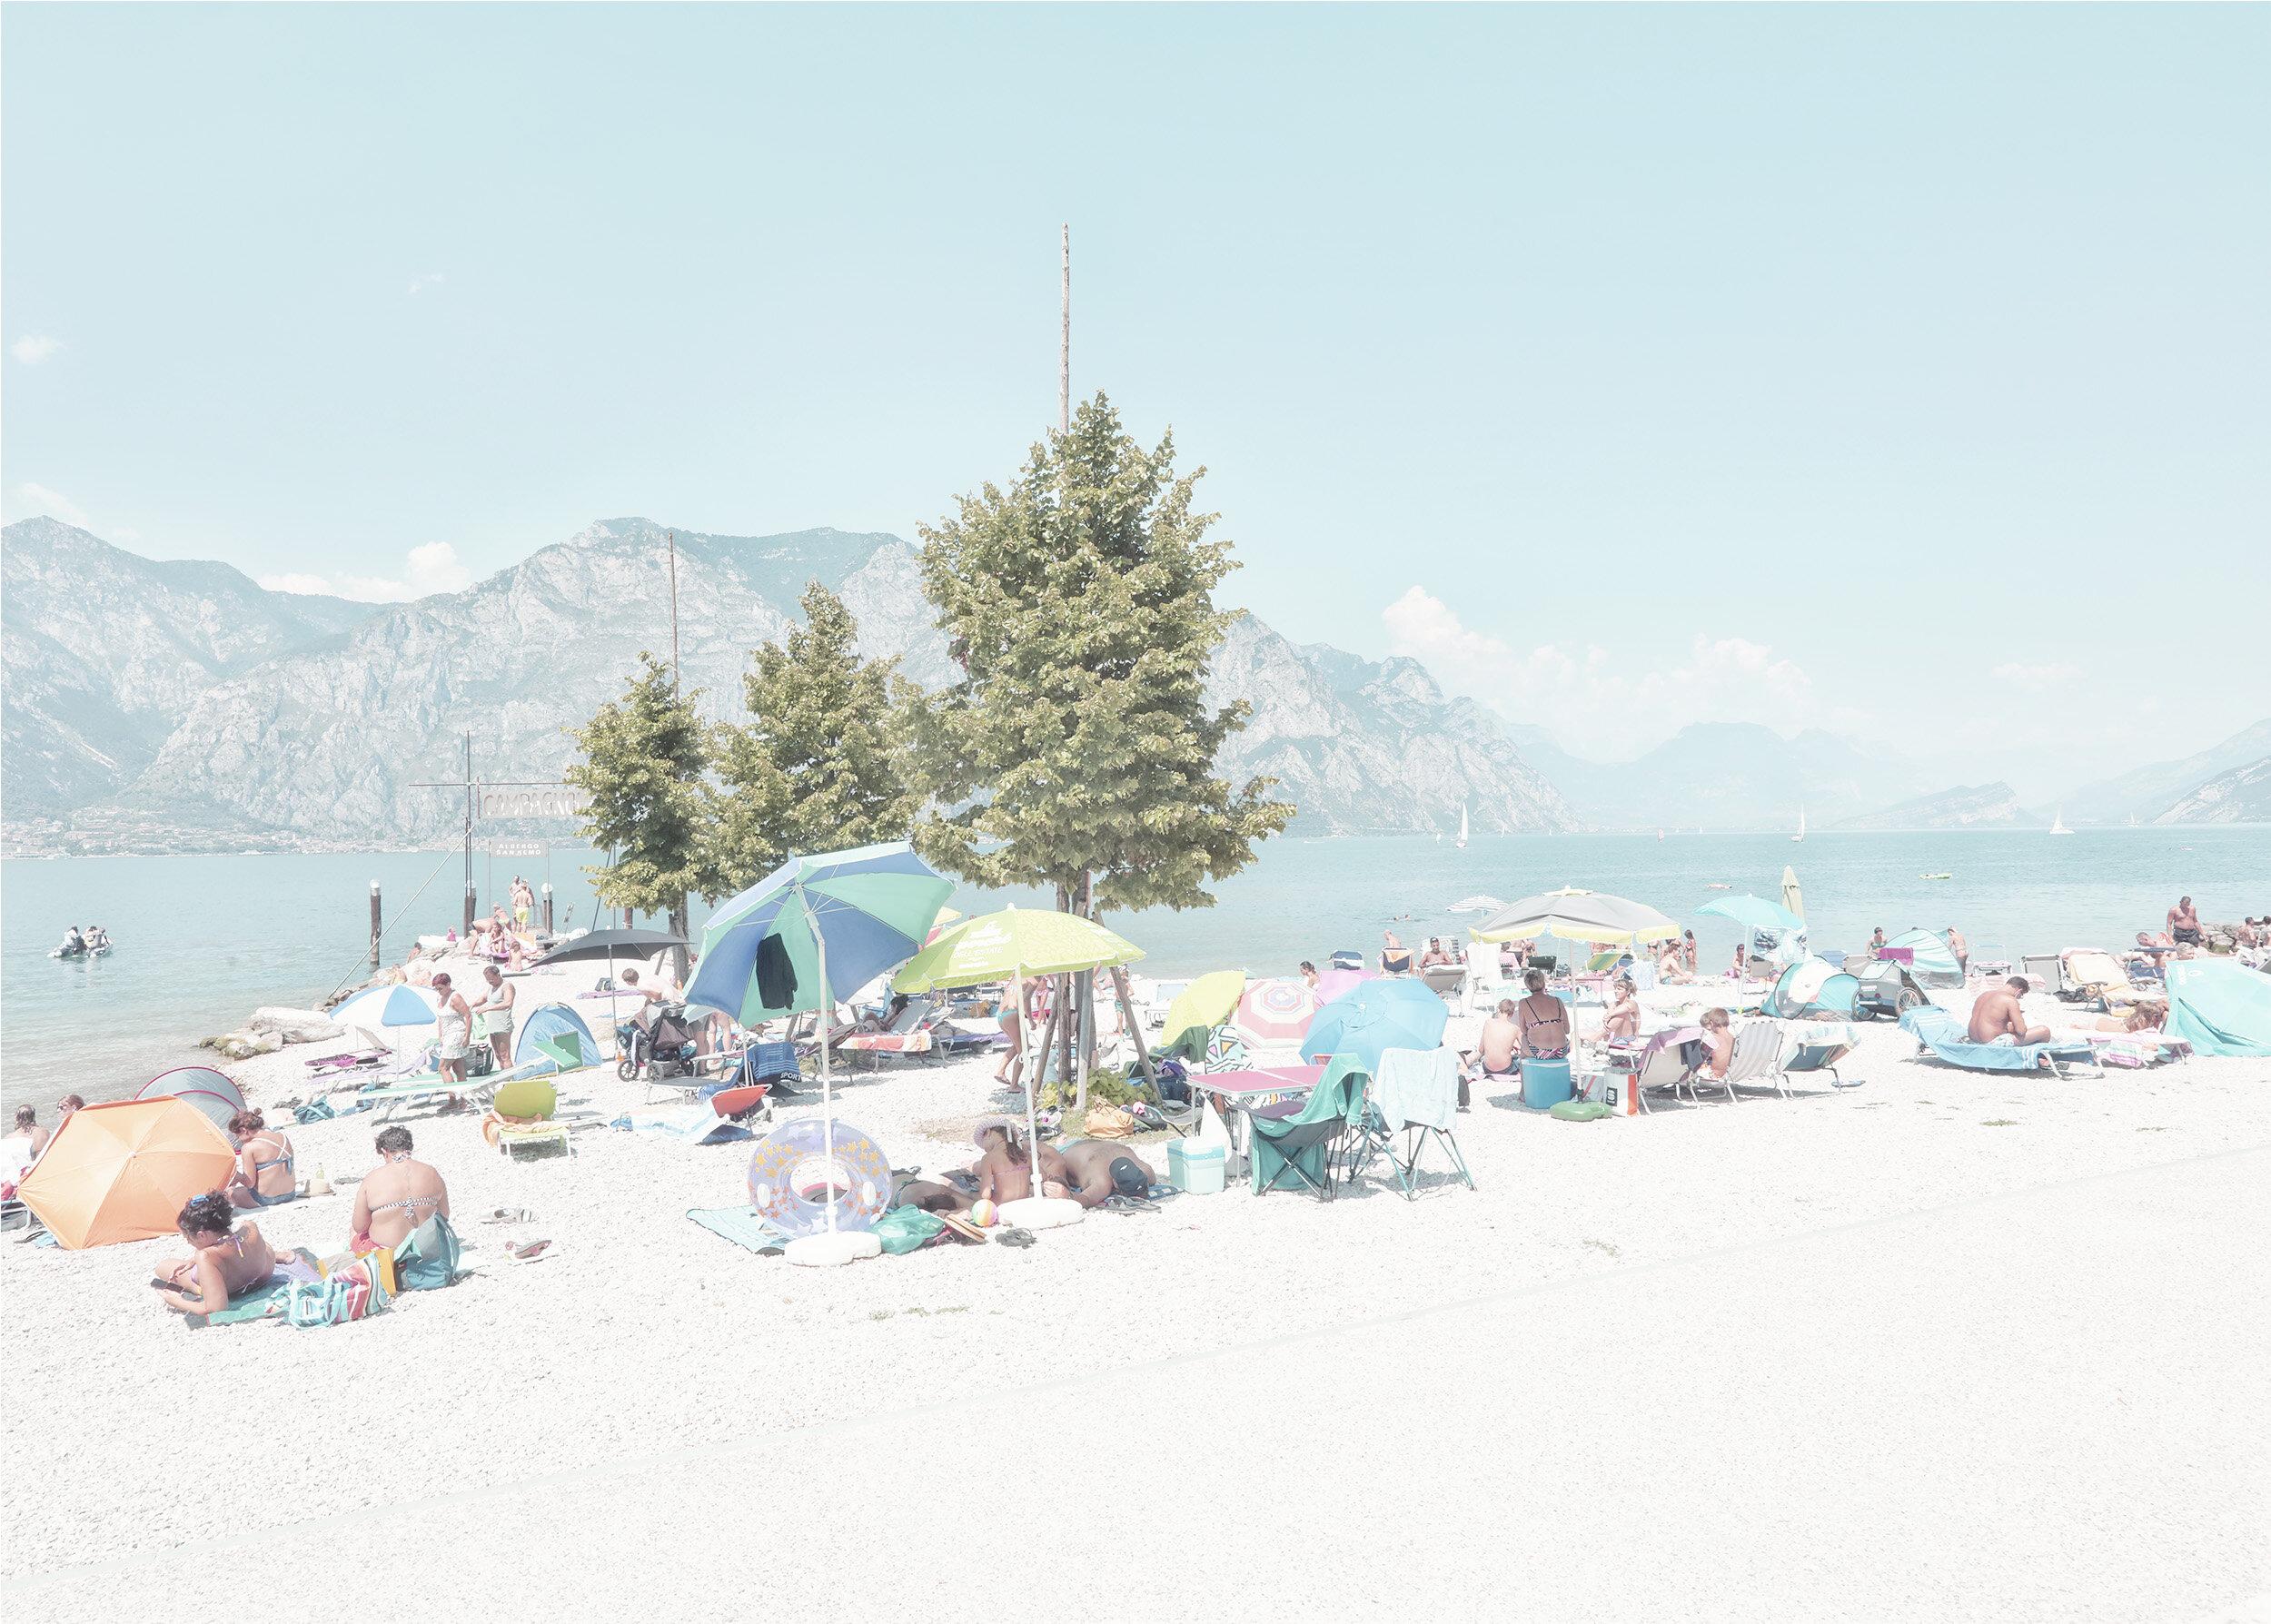 Riva I - Lago di Garda, 2018